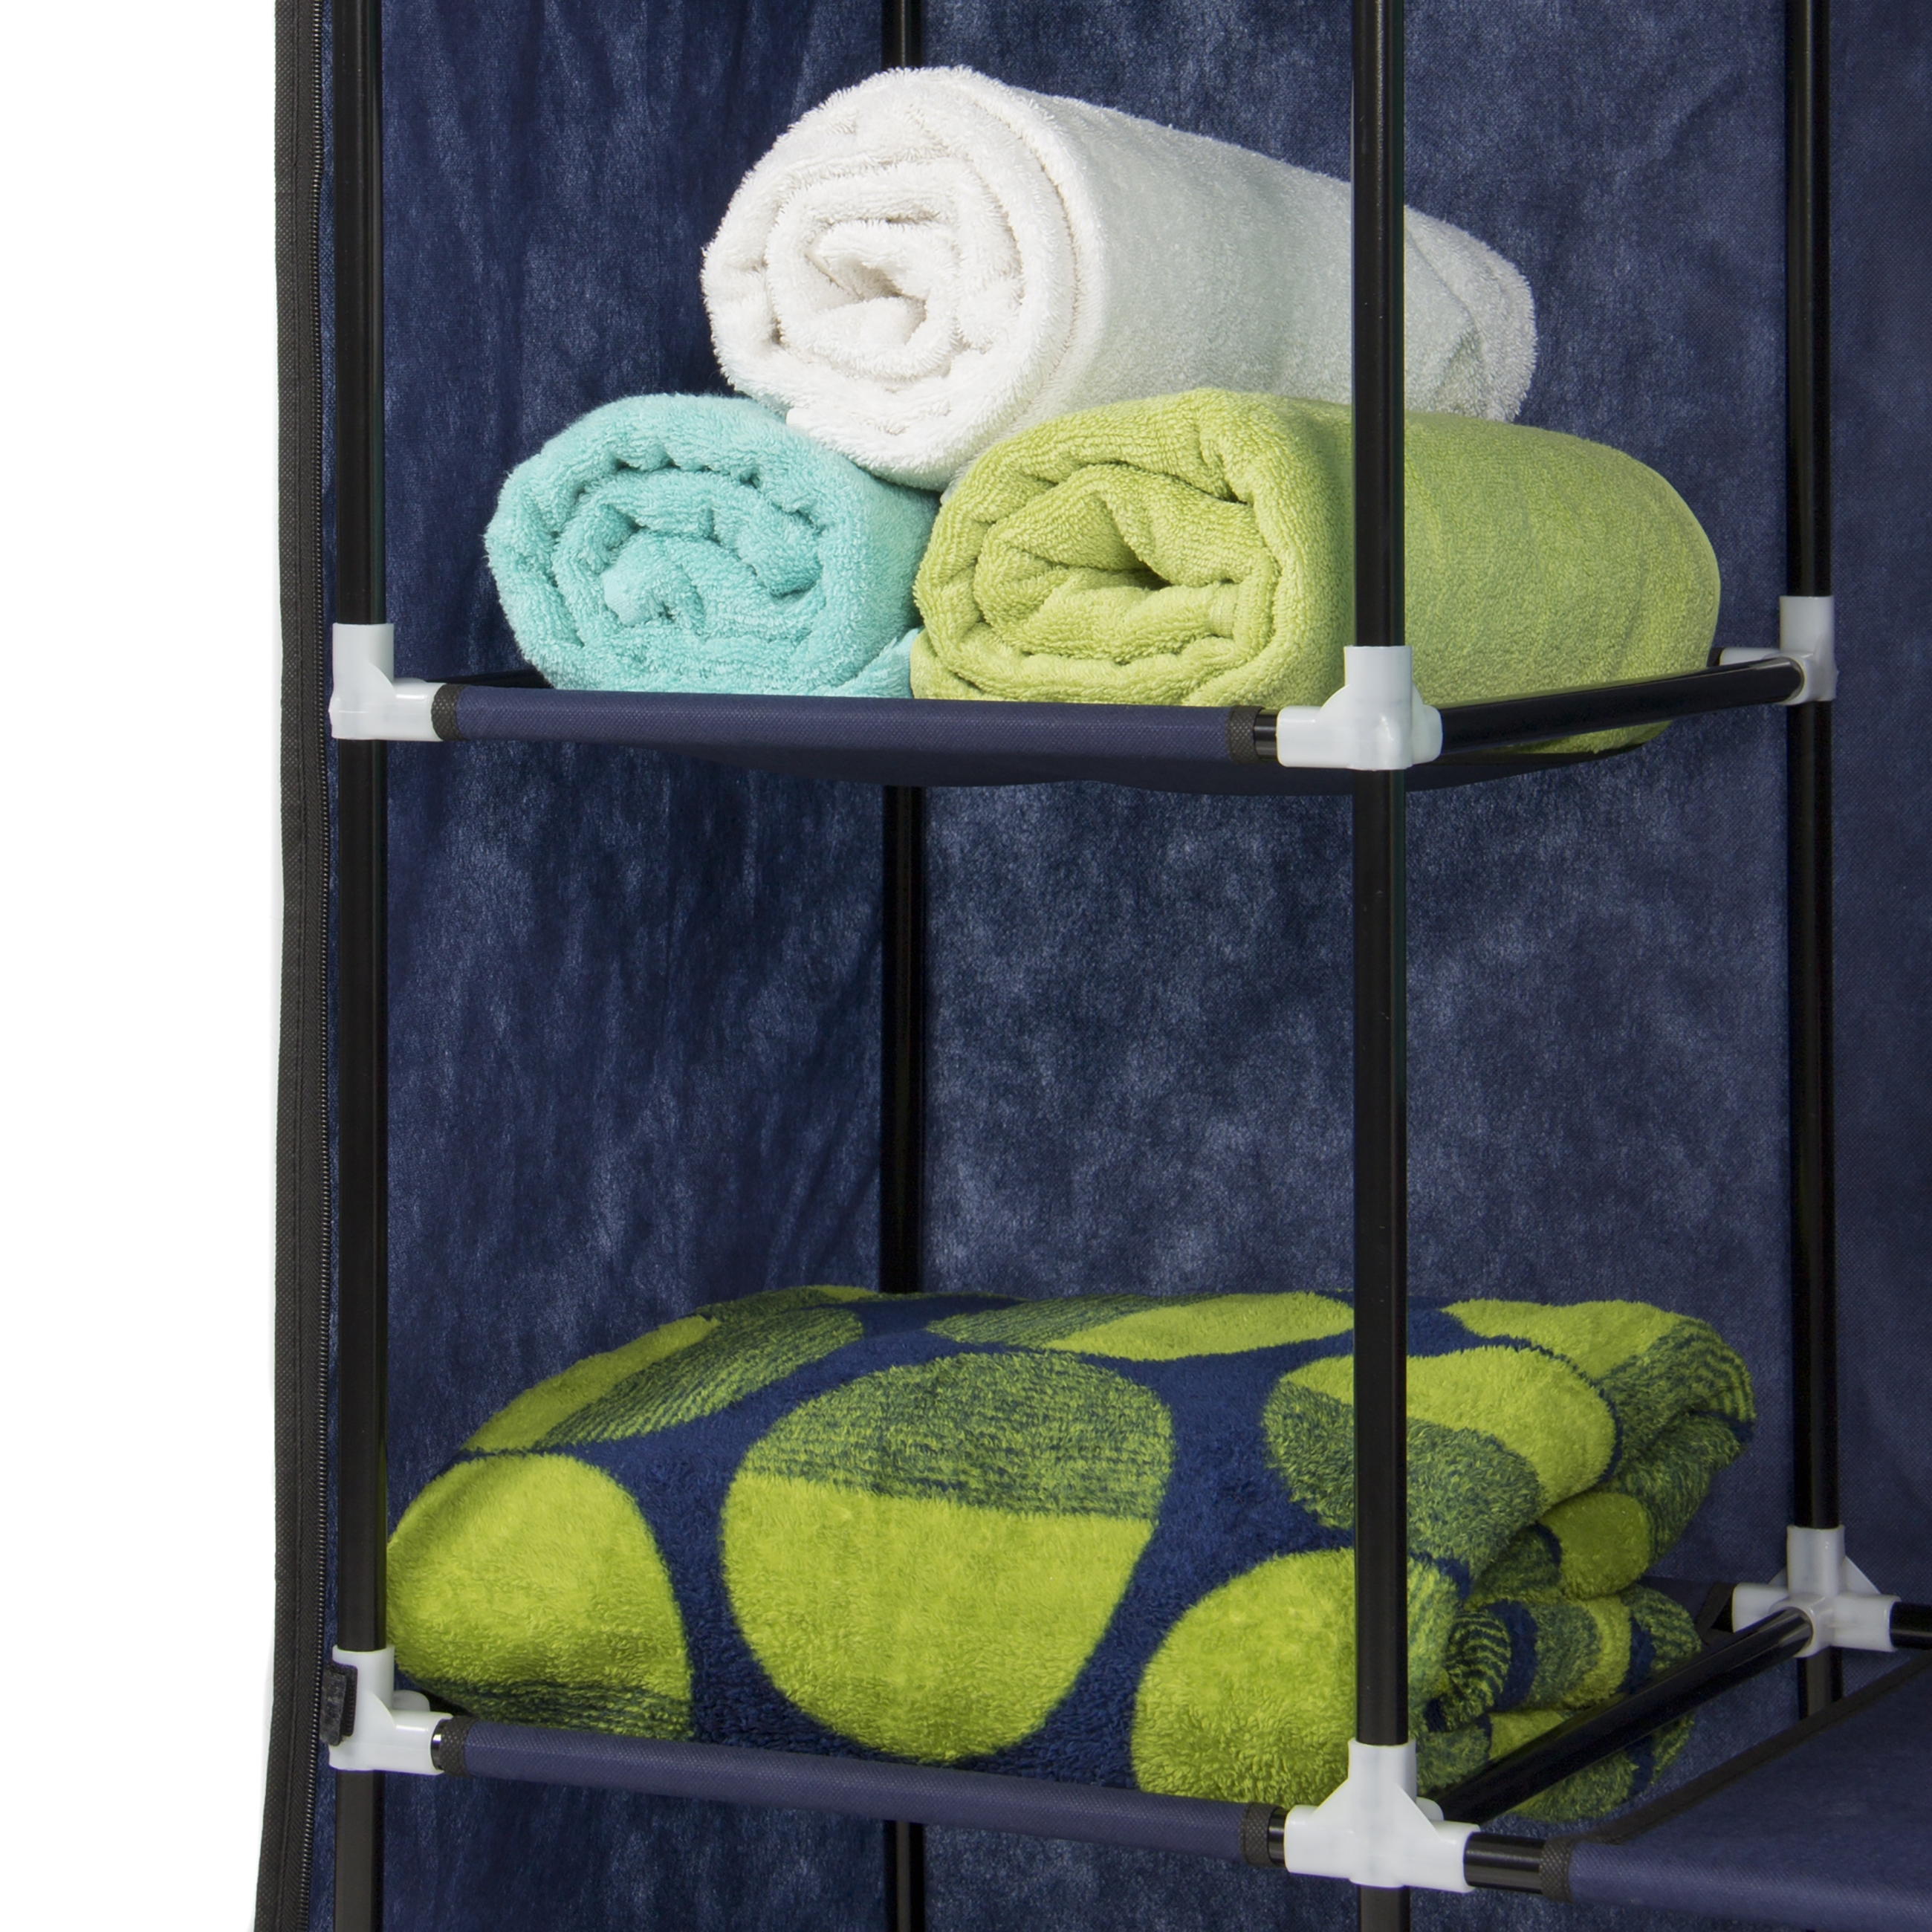 53    Portable Closet Storage Organizer Wardrobe Clothes Rack Within On The Go With A Portable Wardrobe Closet (Image 2 of 27)